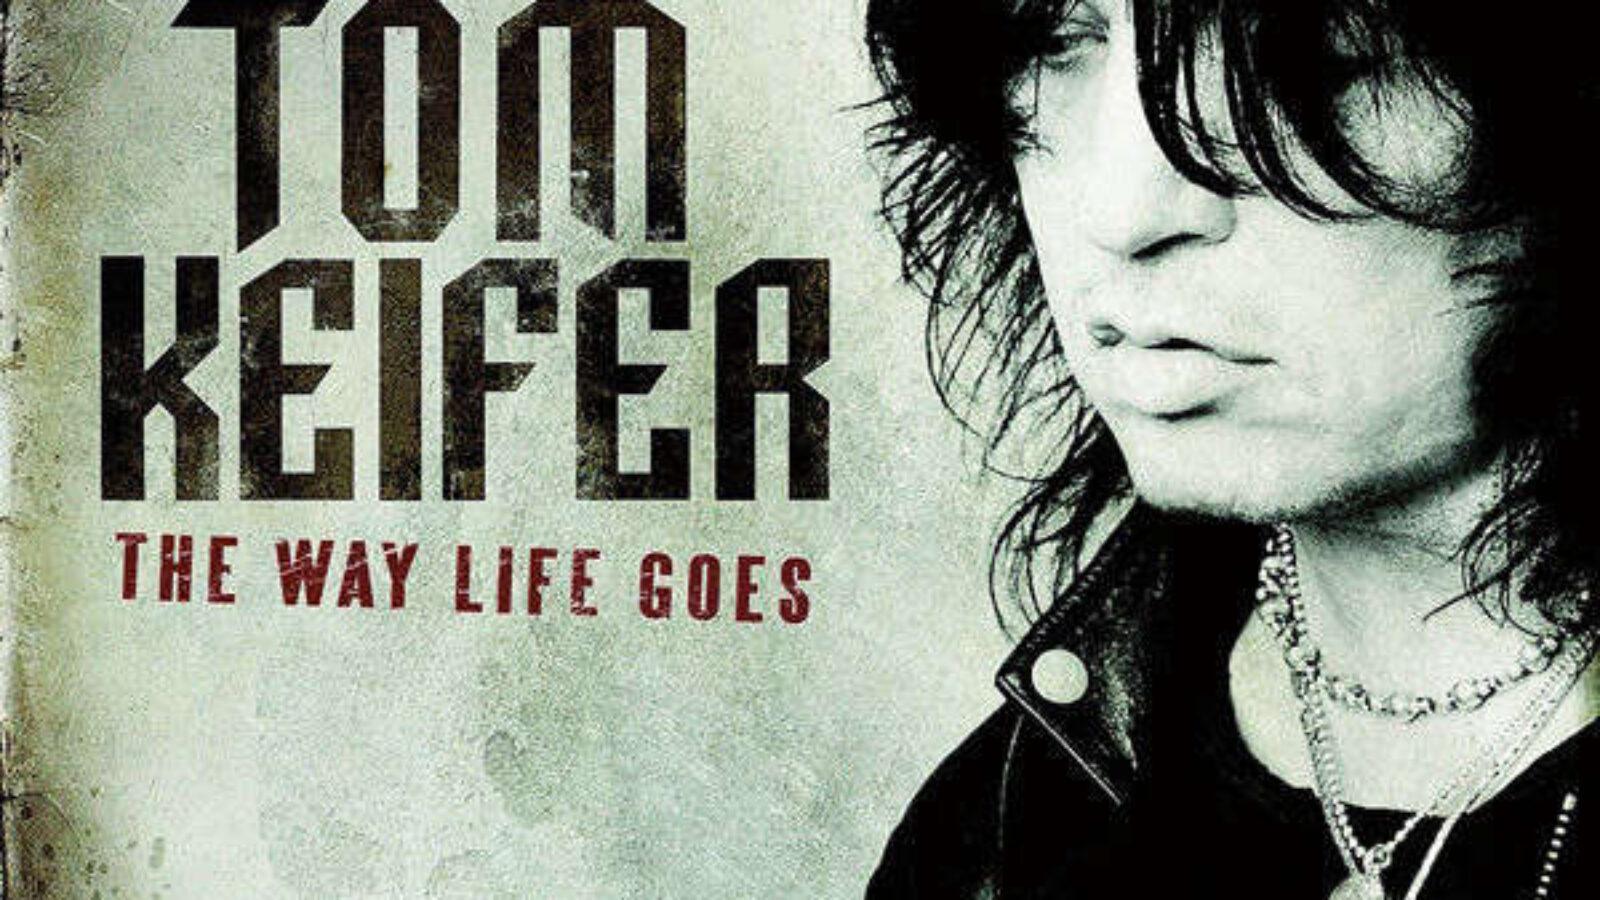 TOM KEIFER The Way Life Goes